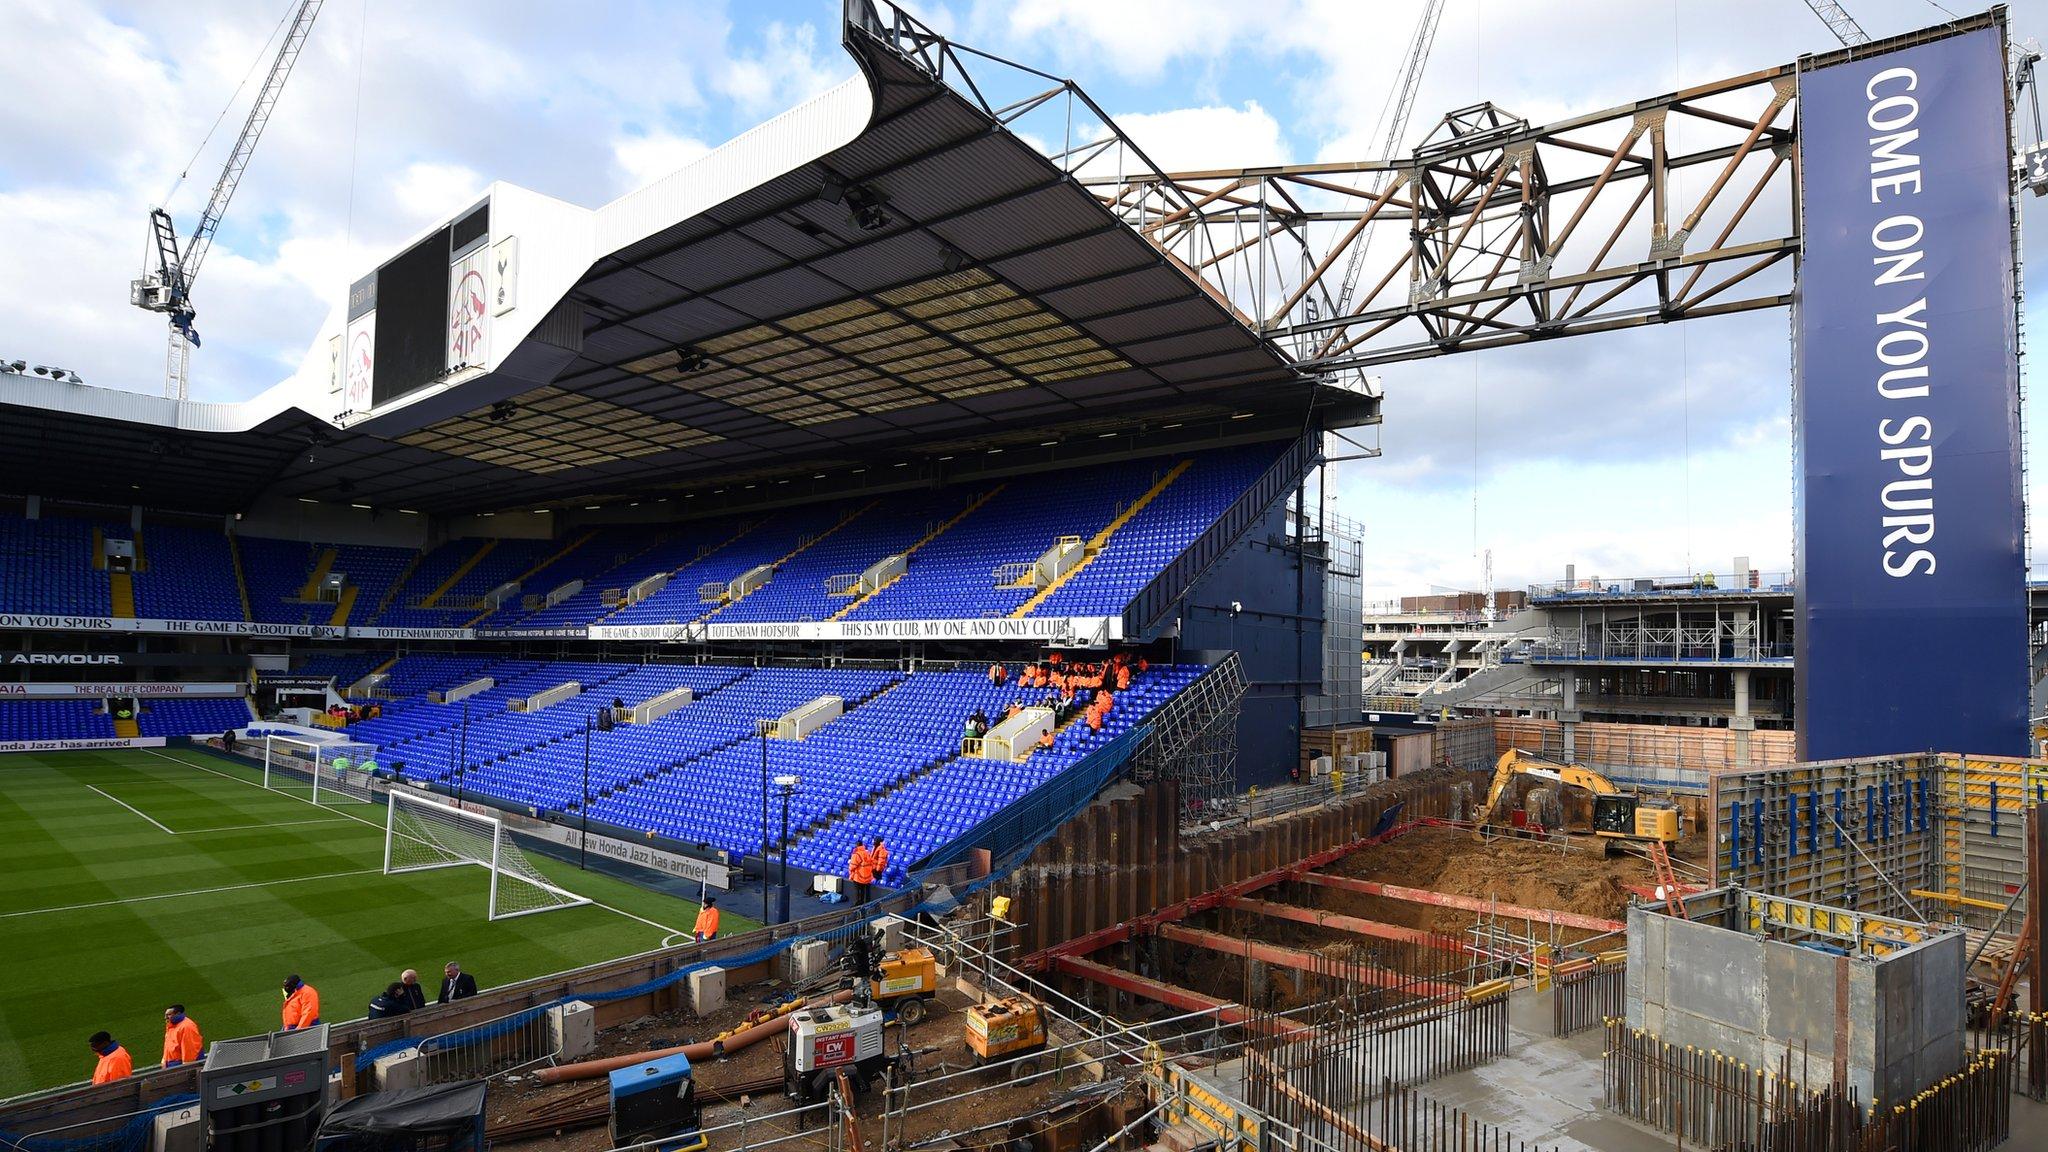 Tottenham may play at White Hart Lane in 2017-18